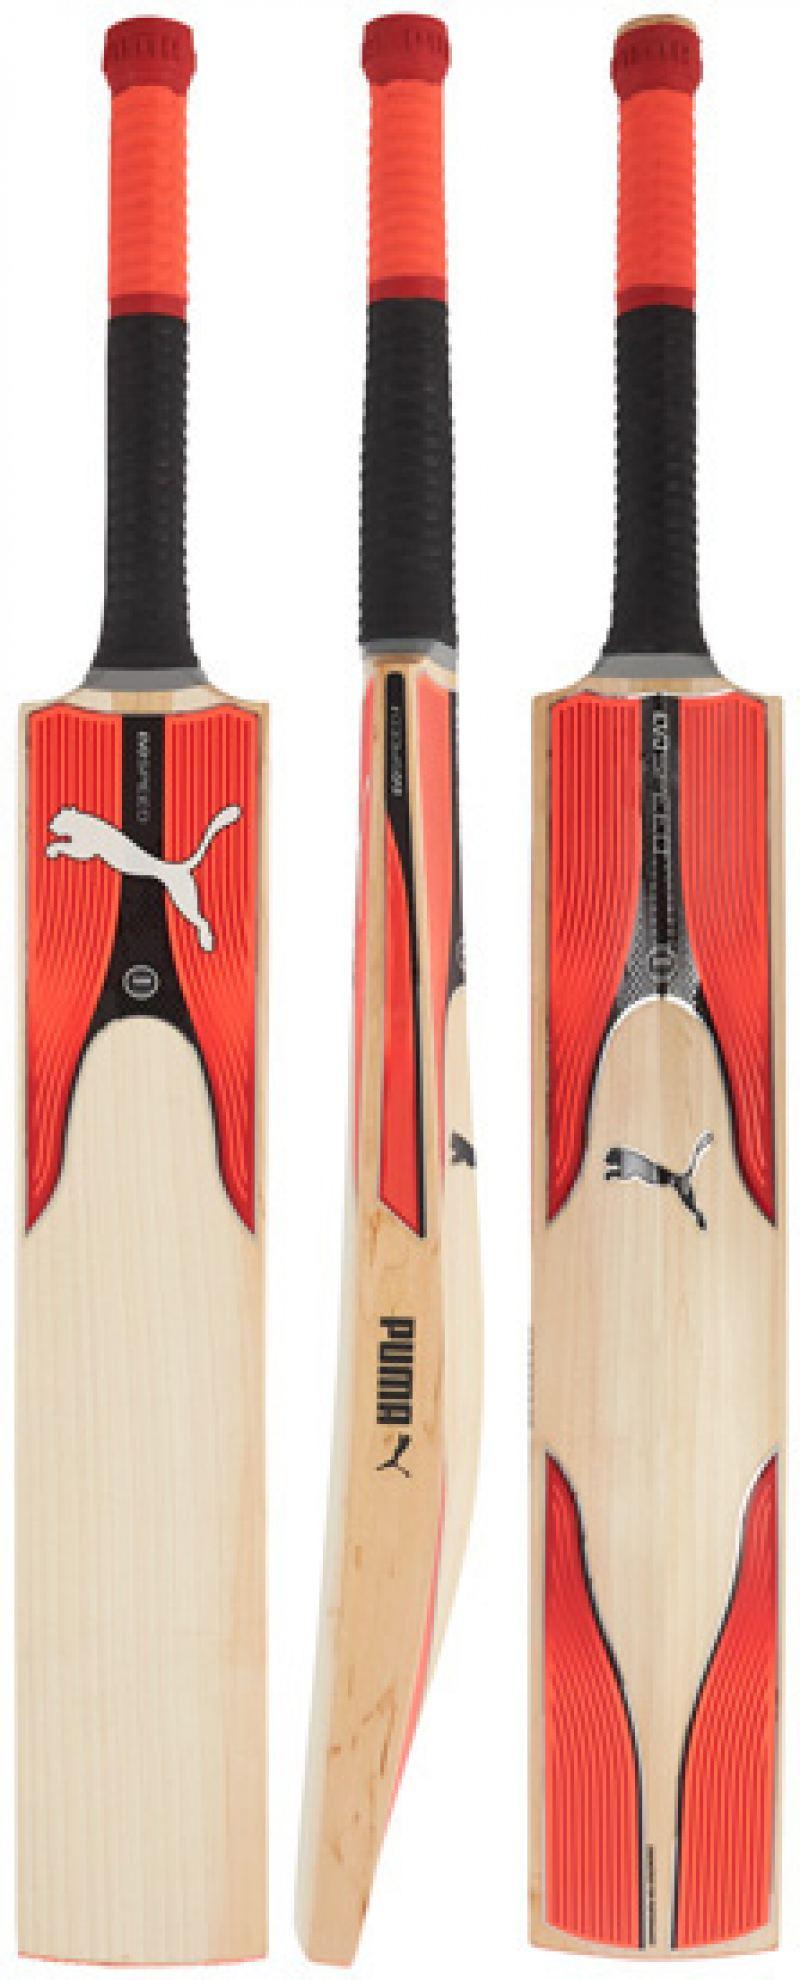 Puma EvoSpeed 3.17 Cricket Bat